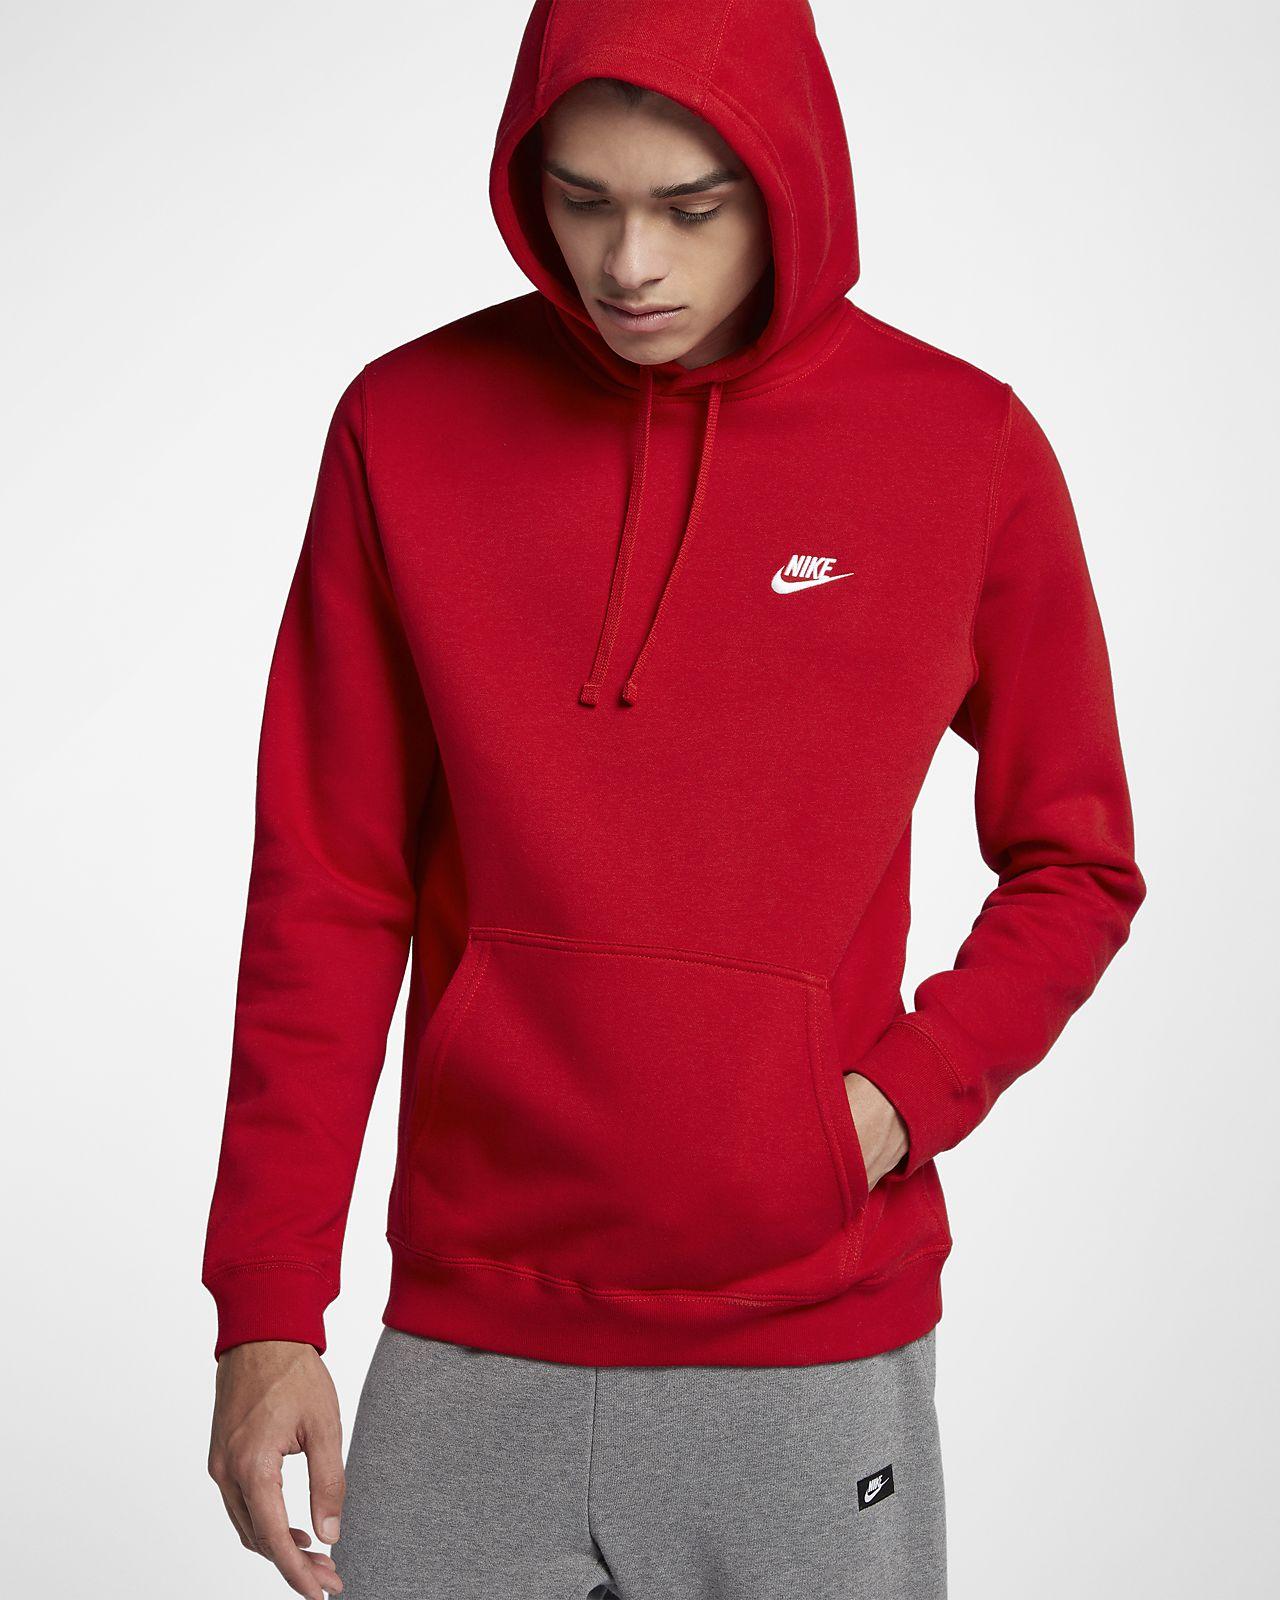 Nike Sportswear Pullover Hoodie. Nike.com 40ebcddee